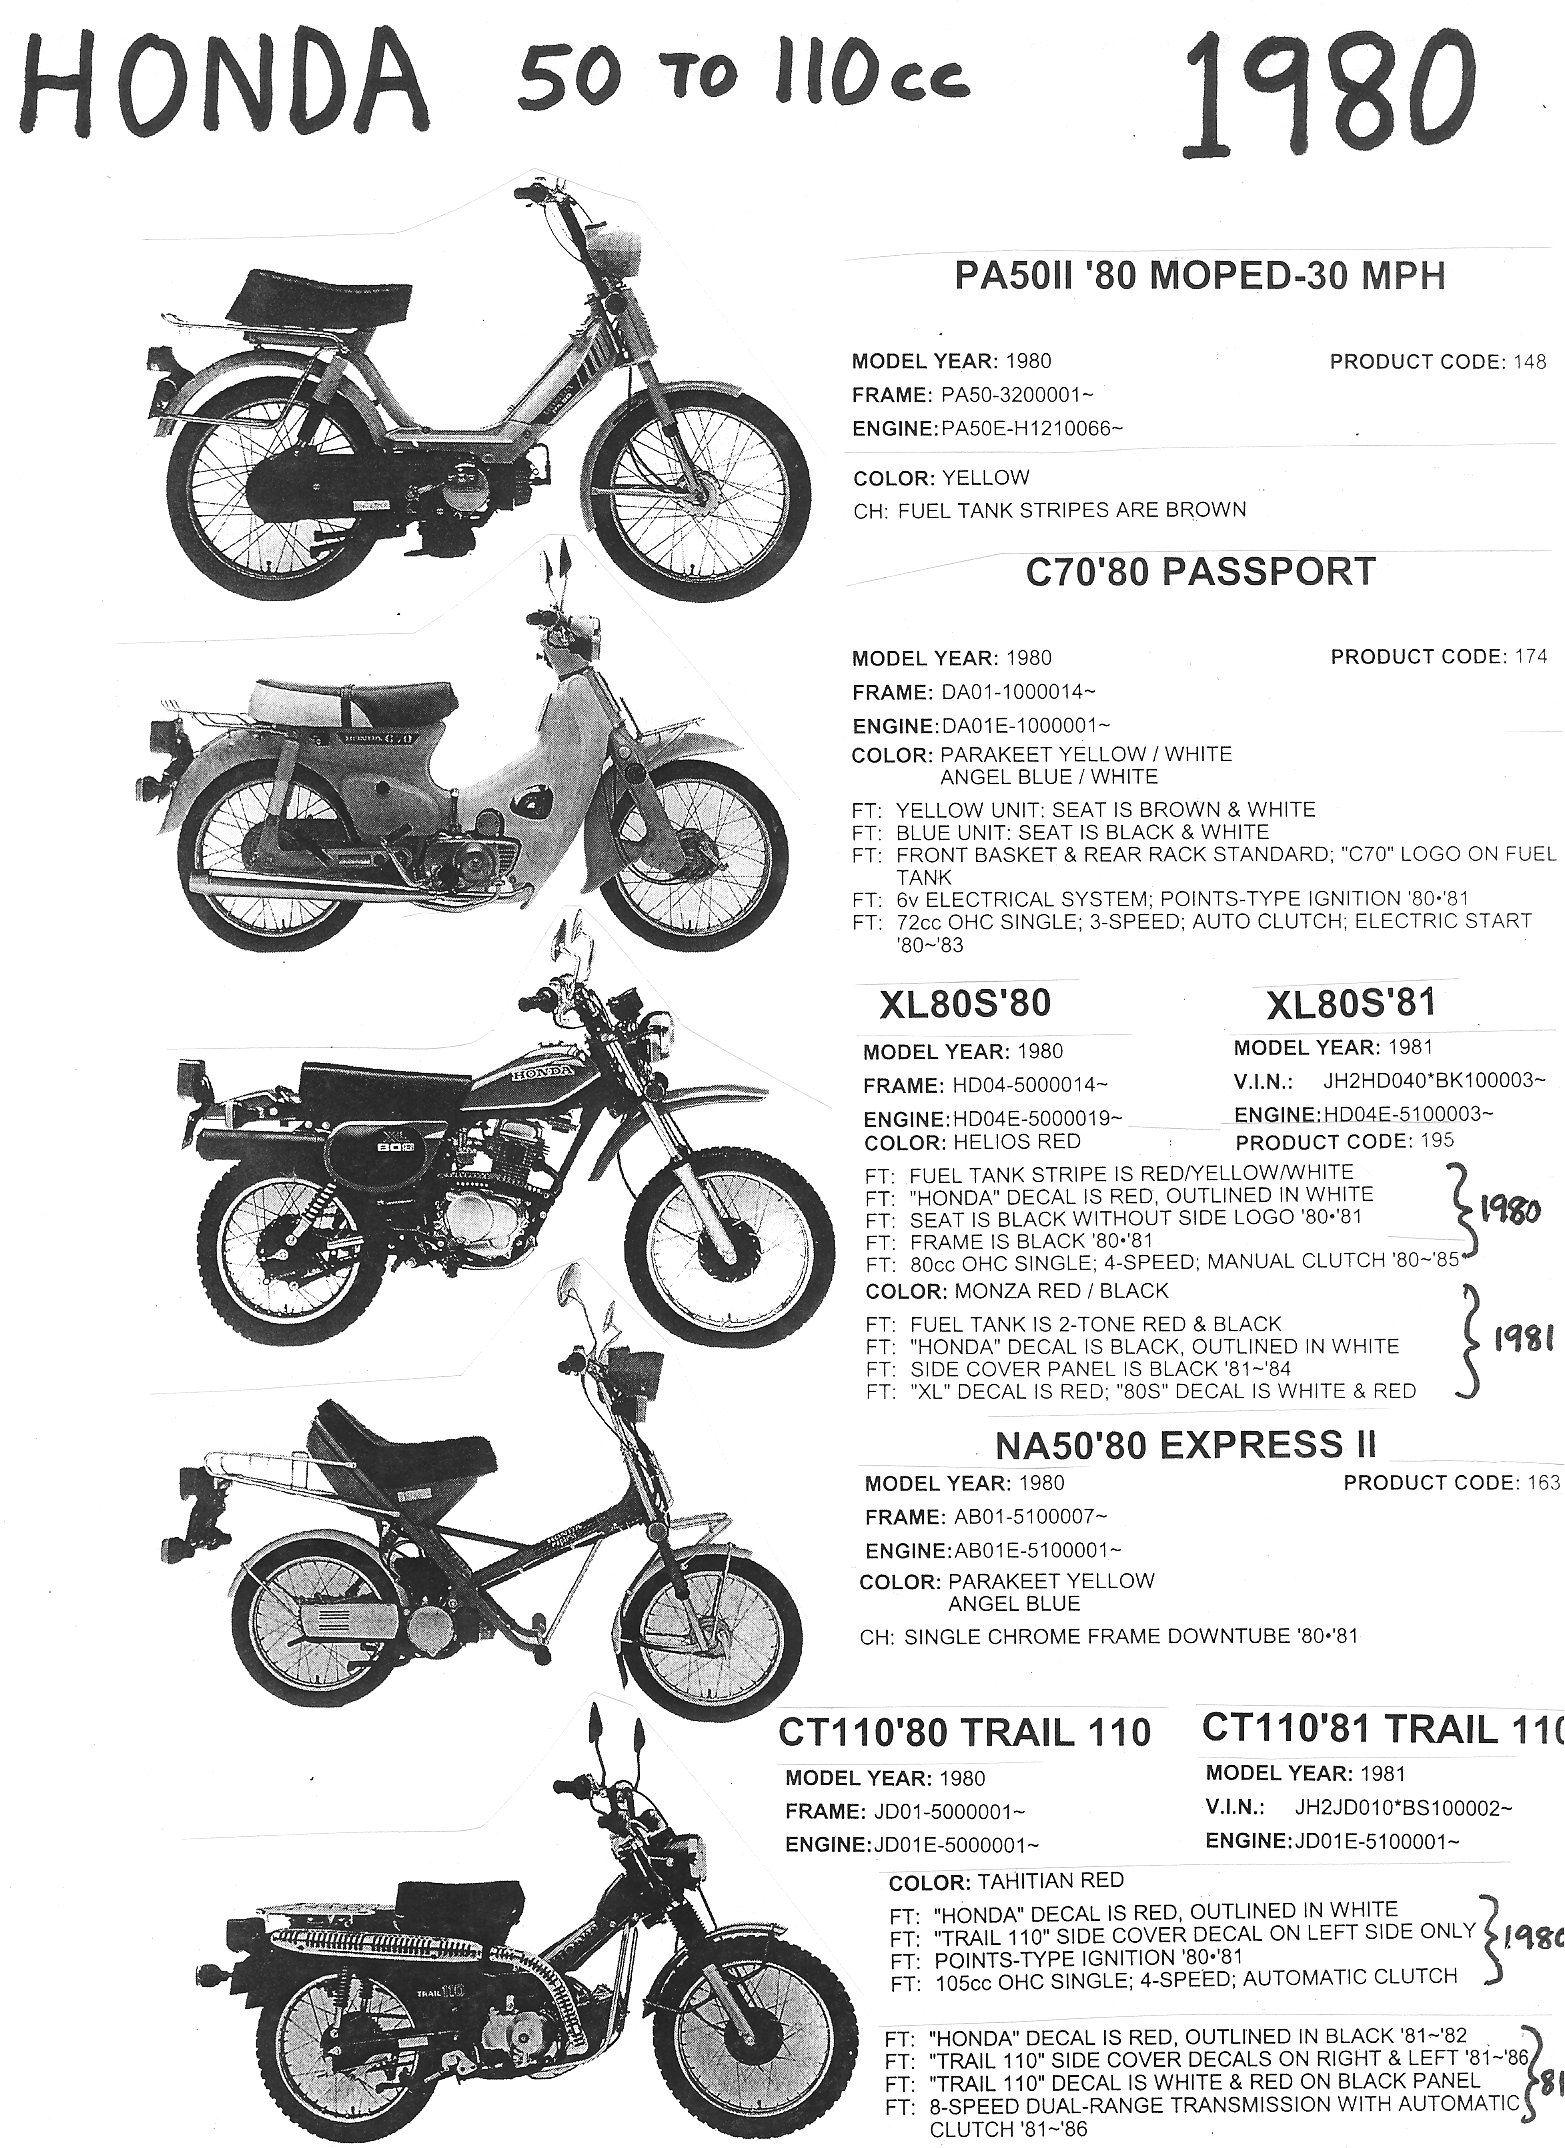 Pin by Greg Johnson on Honda | Pinterest | Motorcycle, Honda and Bike